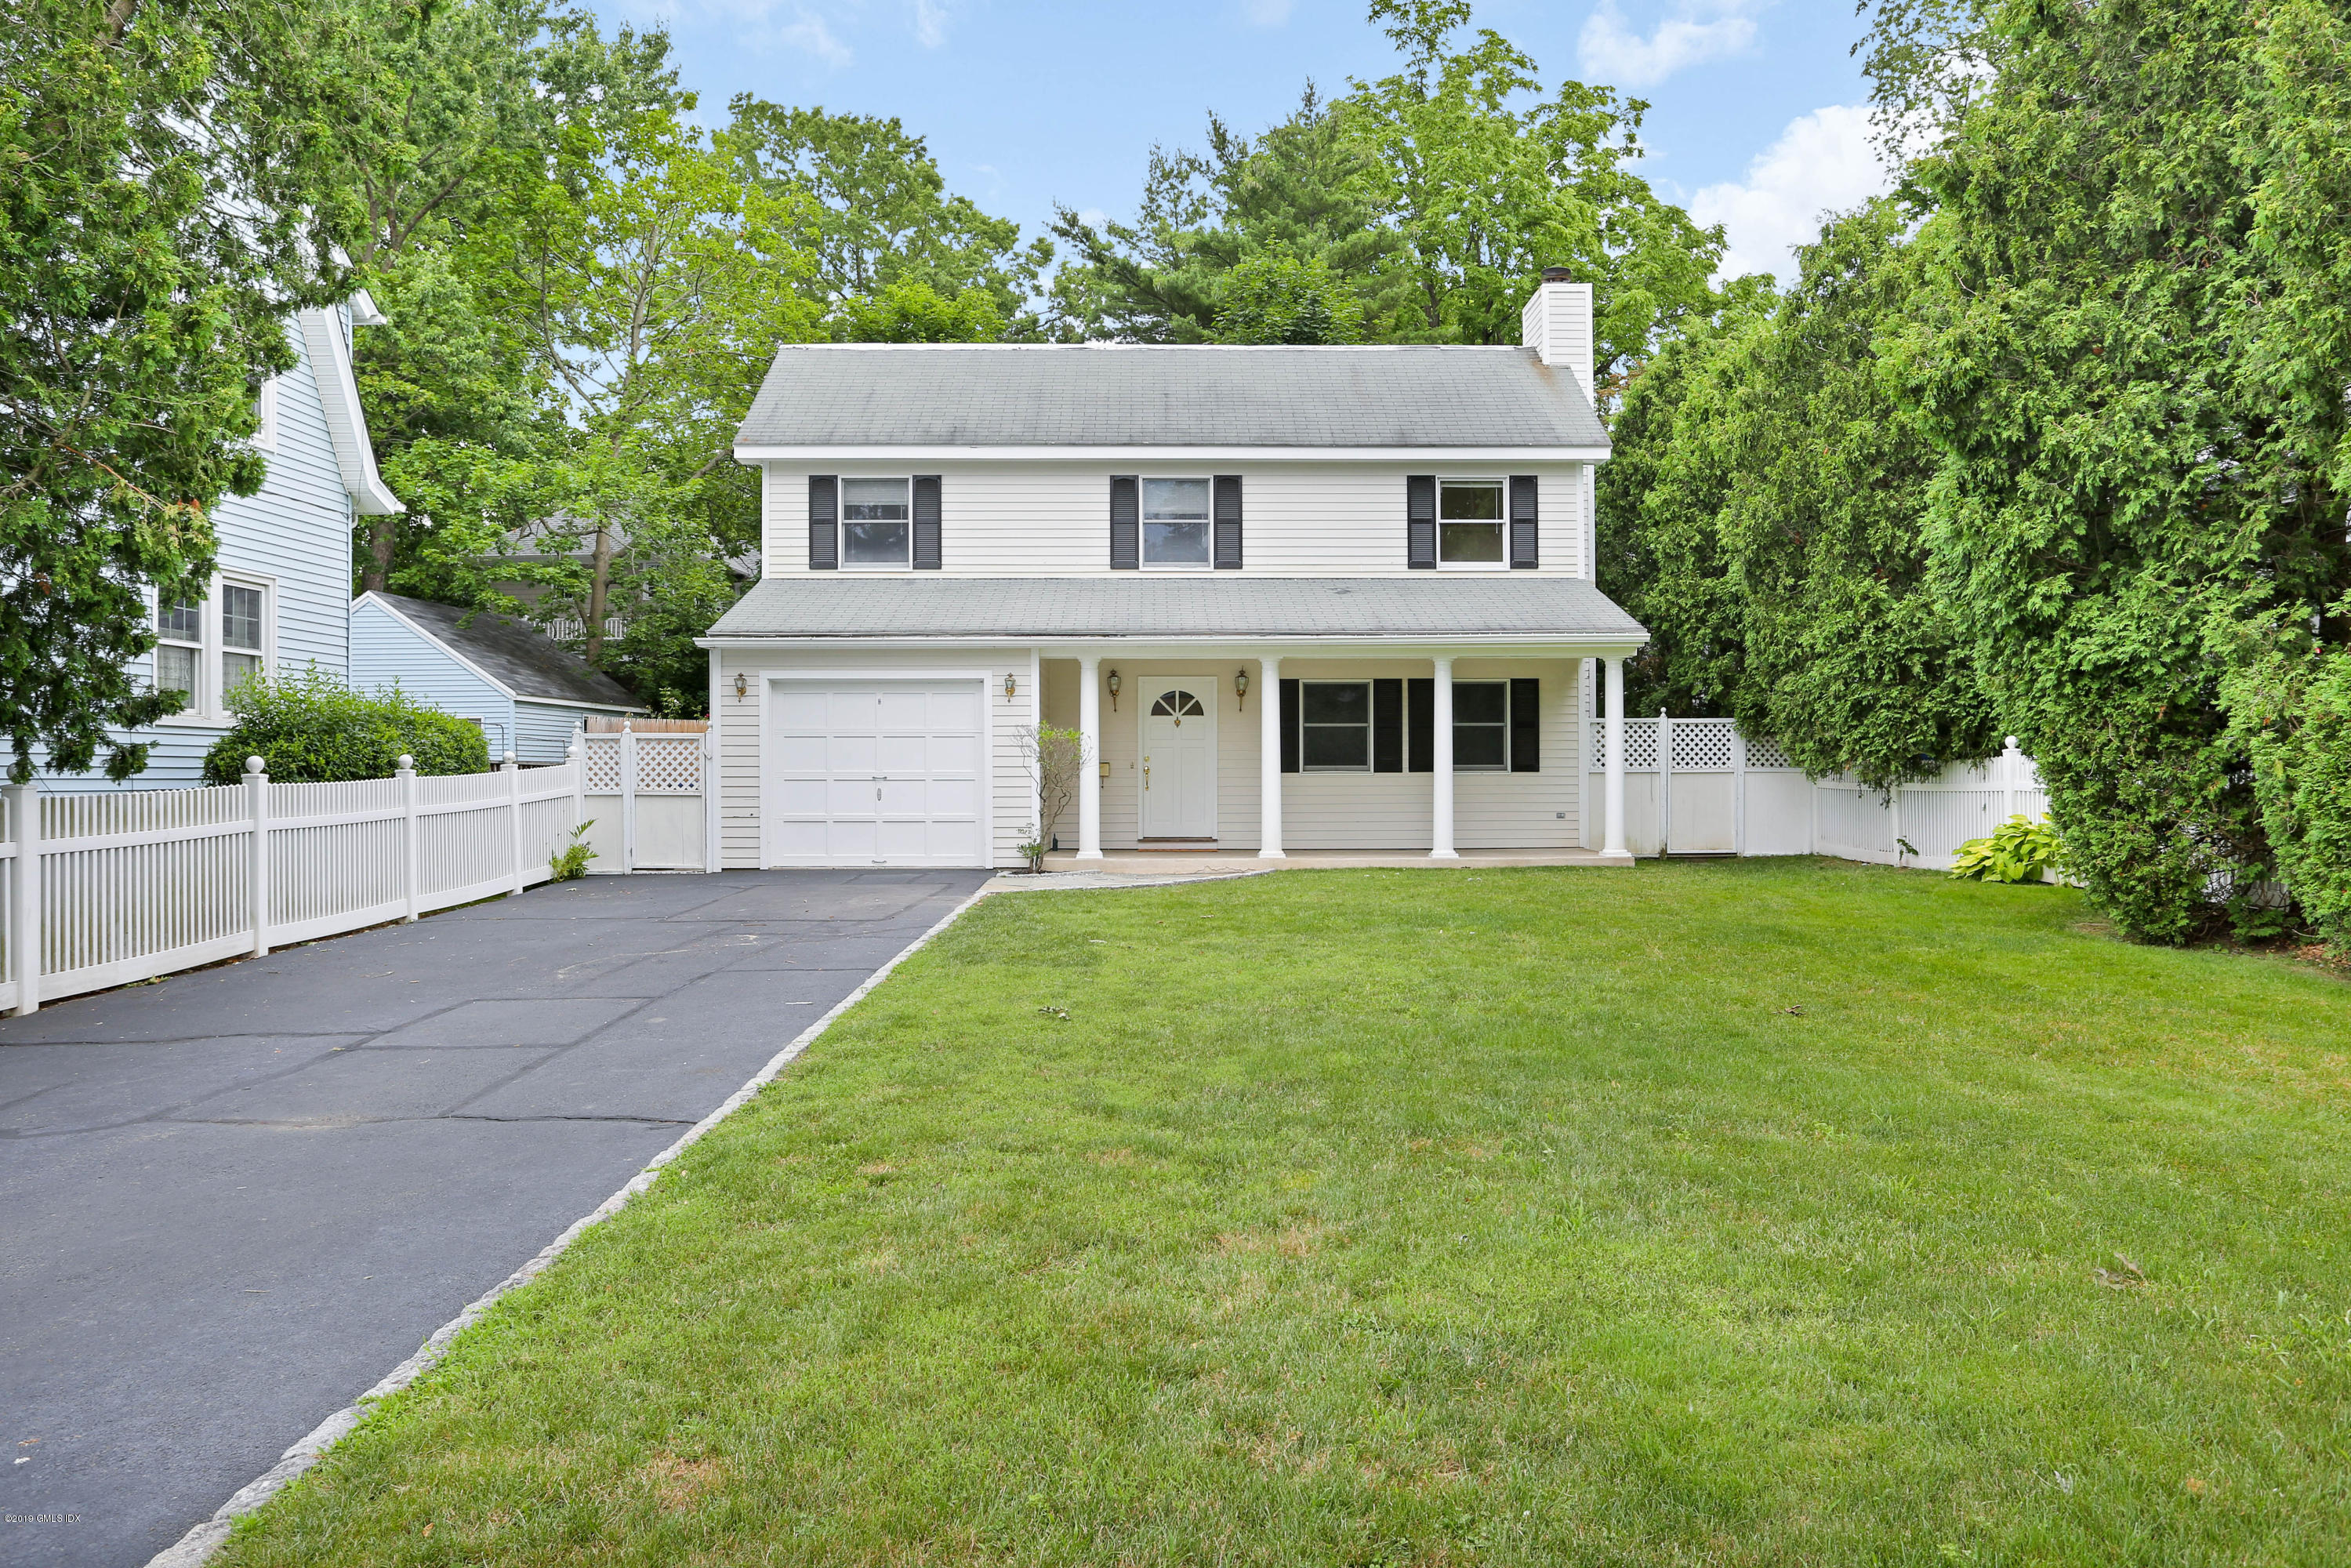 26 Lockwood Drive, Old Greenwich, Connecticut 06870, 4 Bedrooms Bedrooms, ,2 BathroomsBathrooms,Single family,For Rent,Lockwood,112207